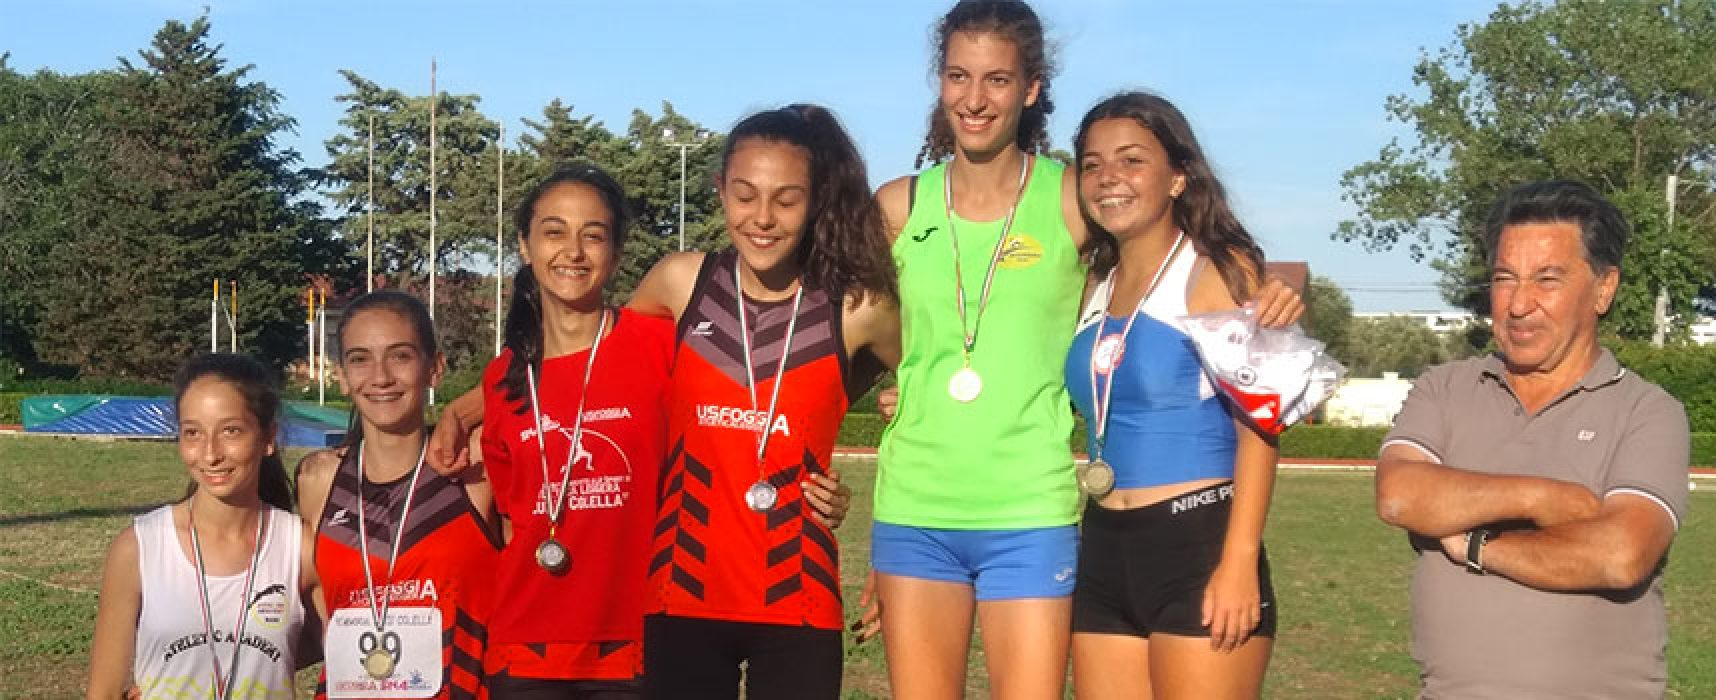 Sara Di Leo (Nuovatletica Bisceglie) campionessa regionale di pentathlon